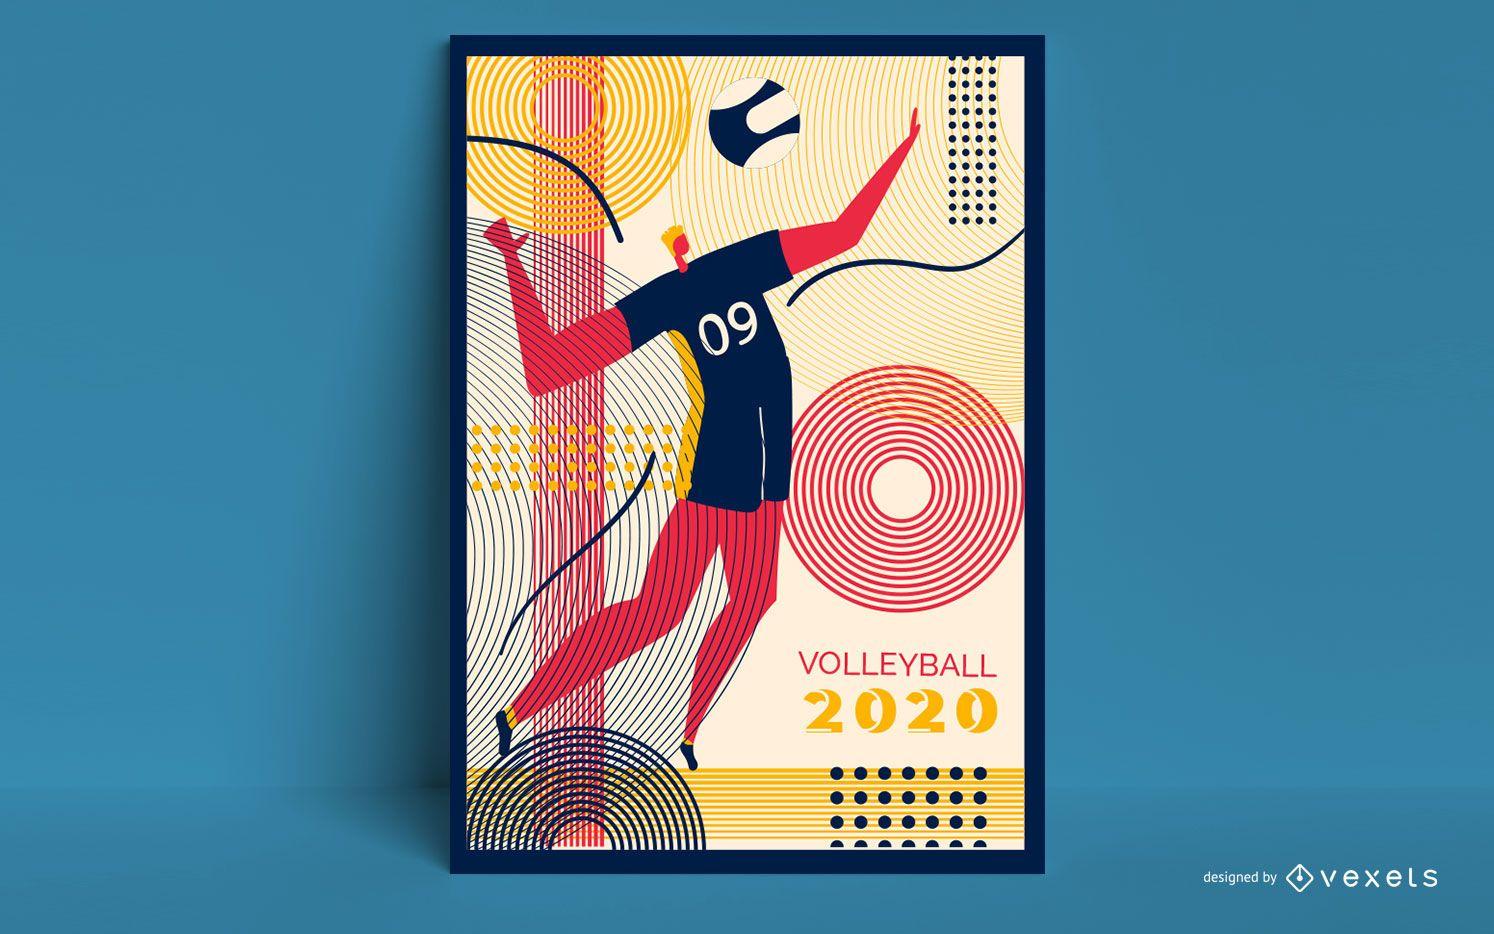 Volleyball Tokyo 2020 Poster Design